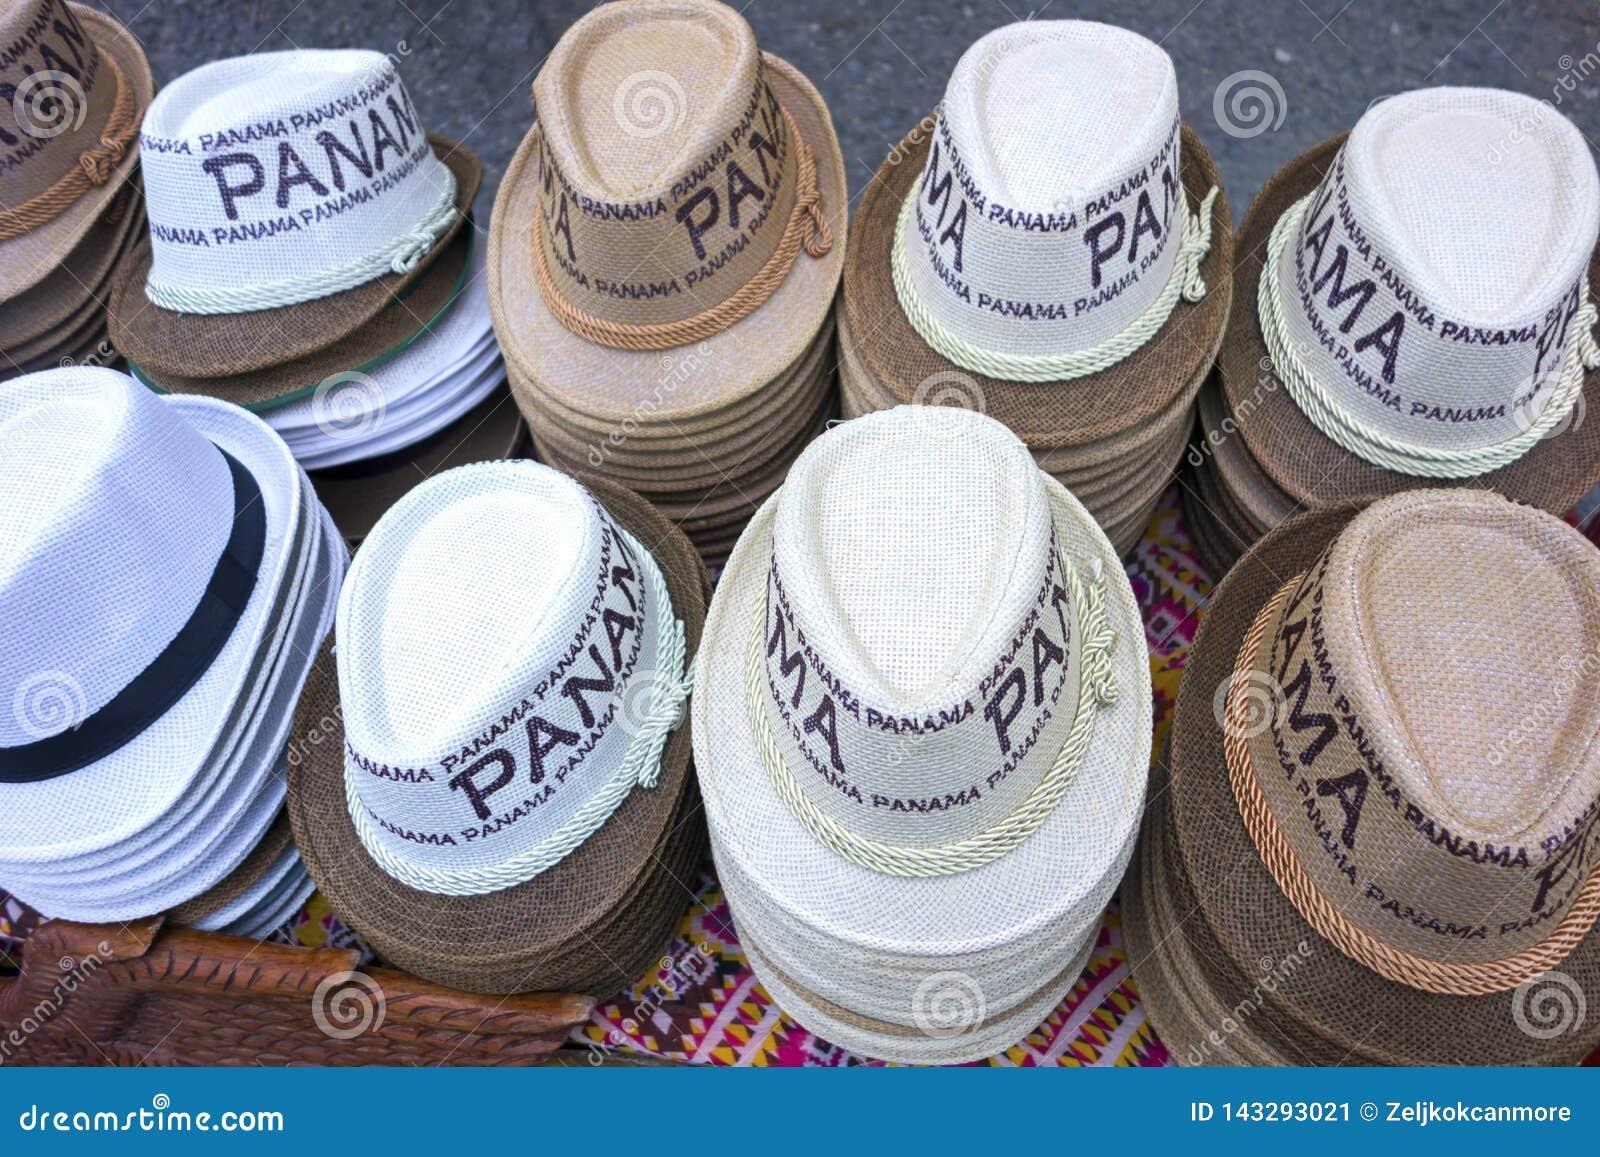 a0d23db3243a46 Shiny Casual Brimmed Hats Clothing Row Tourist Souvenir Shop Panama ...